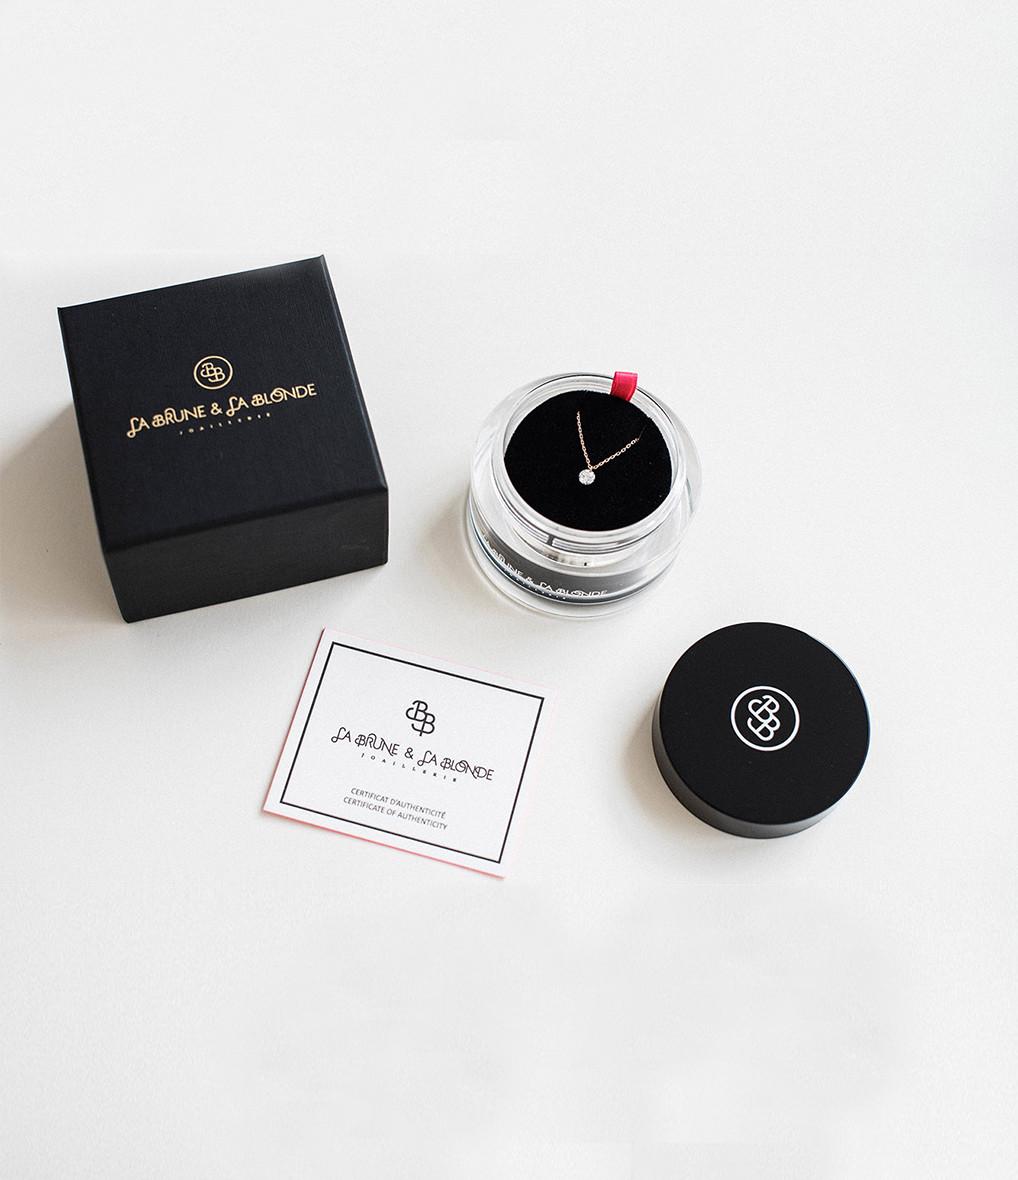 LA BRUNE & LA BLONDE - Créoles Confetti Saphir Rose Or Rose